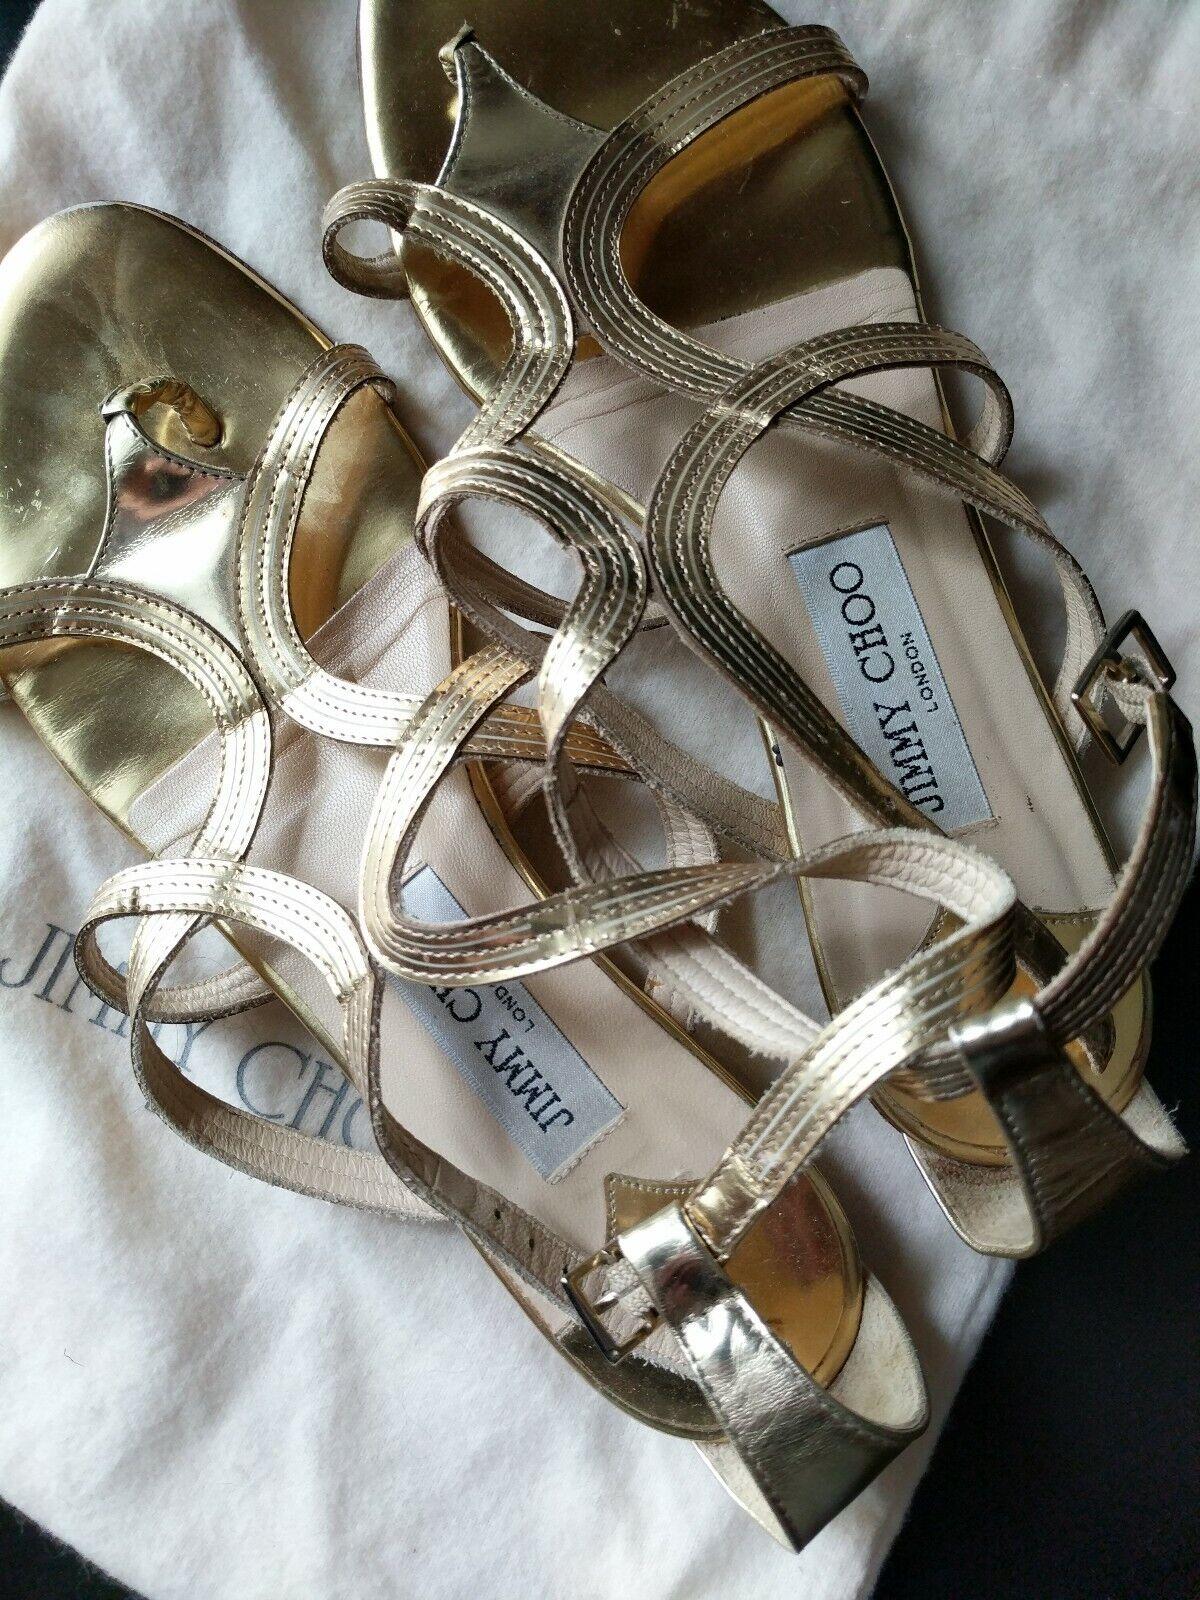 495  JIMY CHOO London Nickel Flat oro Metallic Leather Sandals Flats Dimensione 38